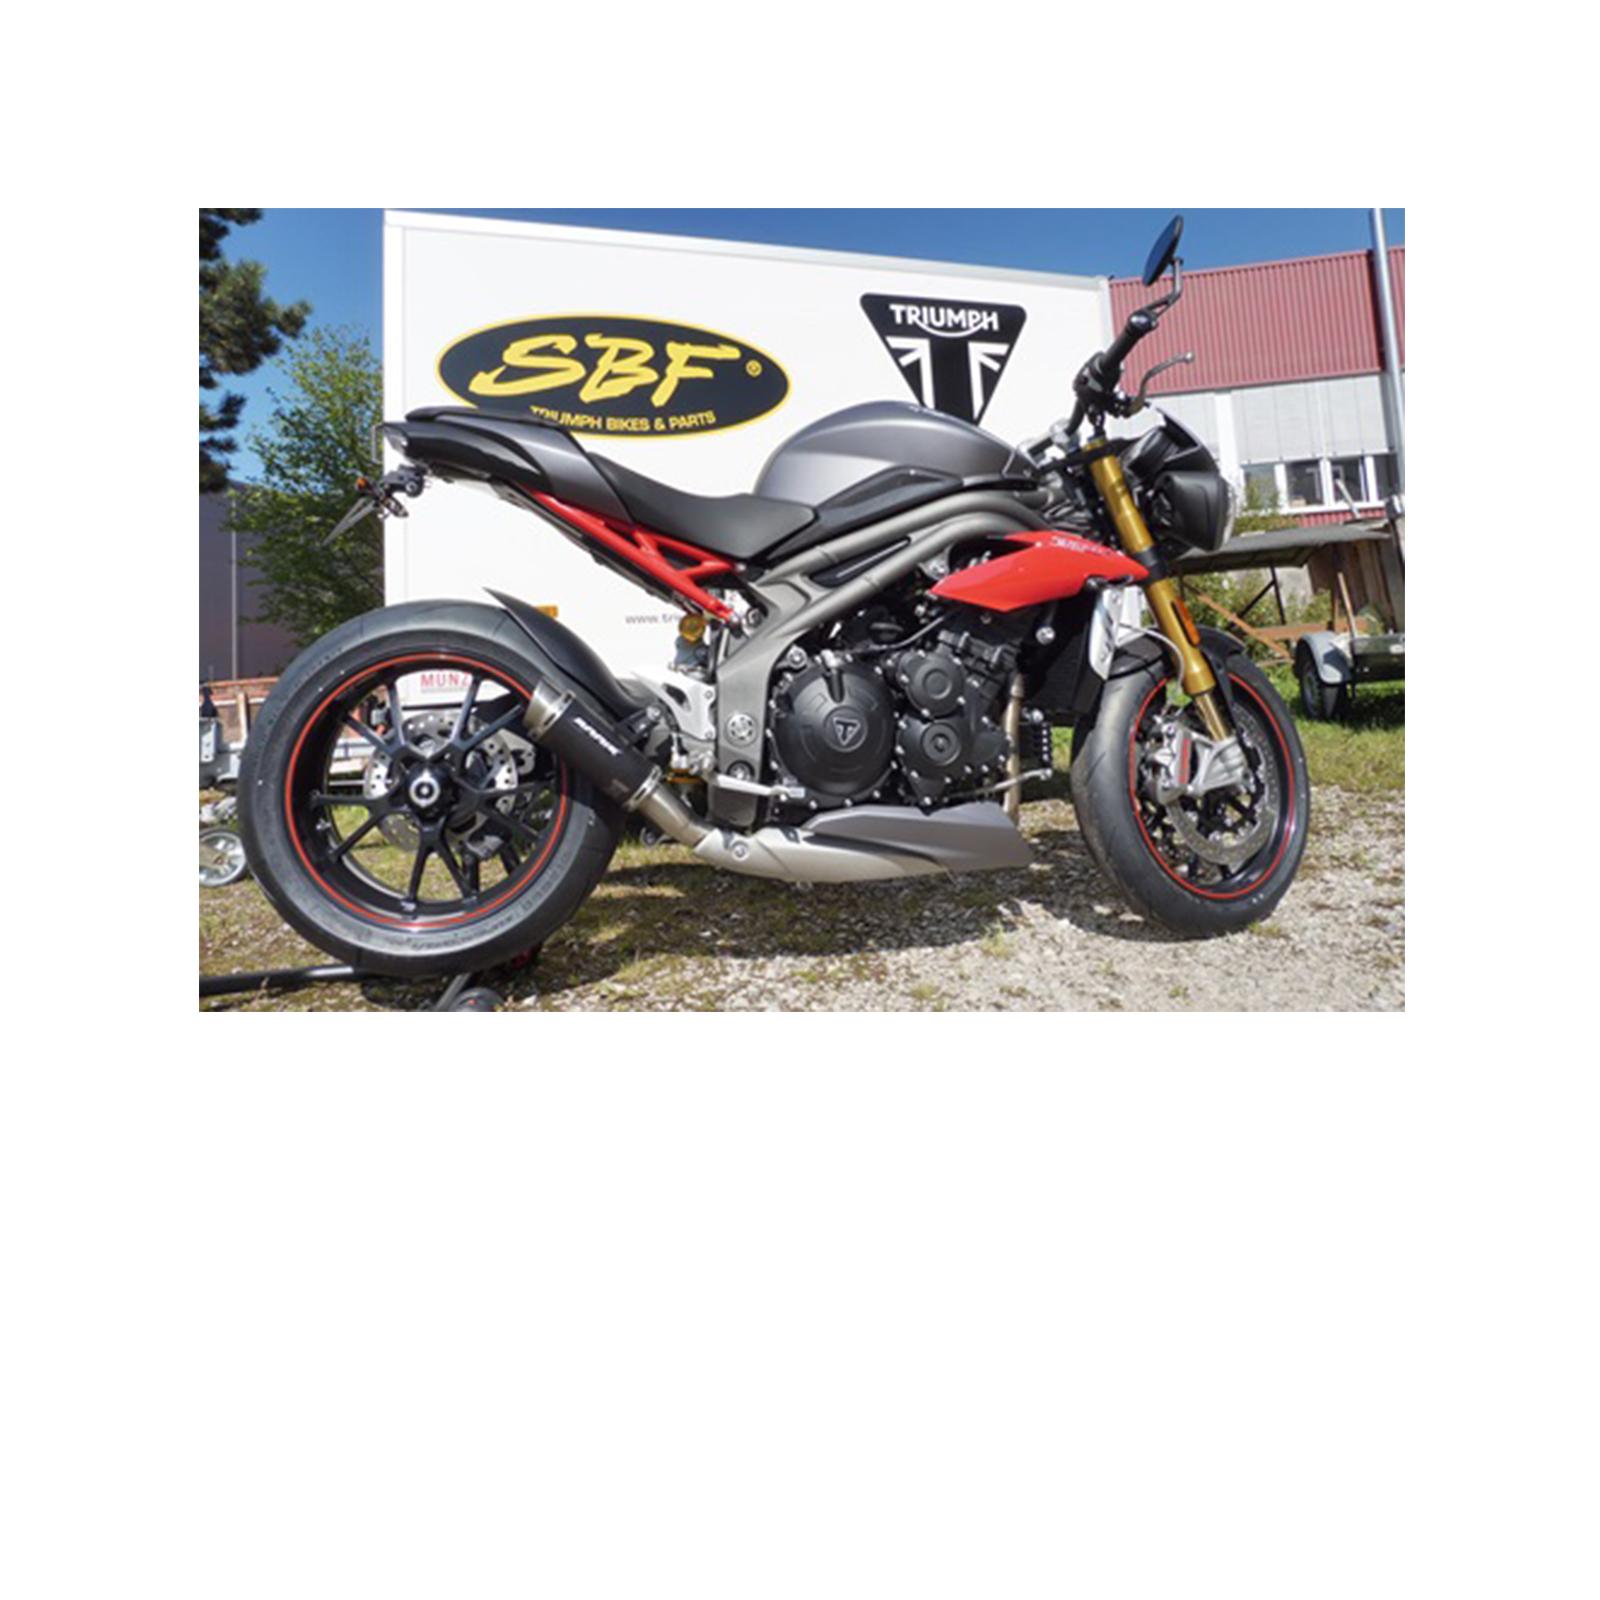 Bodis GPC-RSII Slip-On Speed Triple 1050 S/R